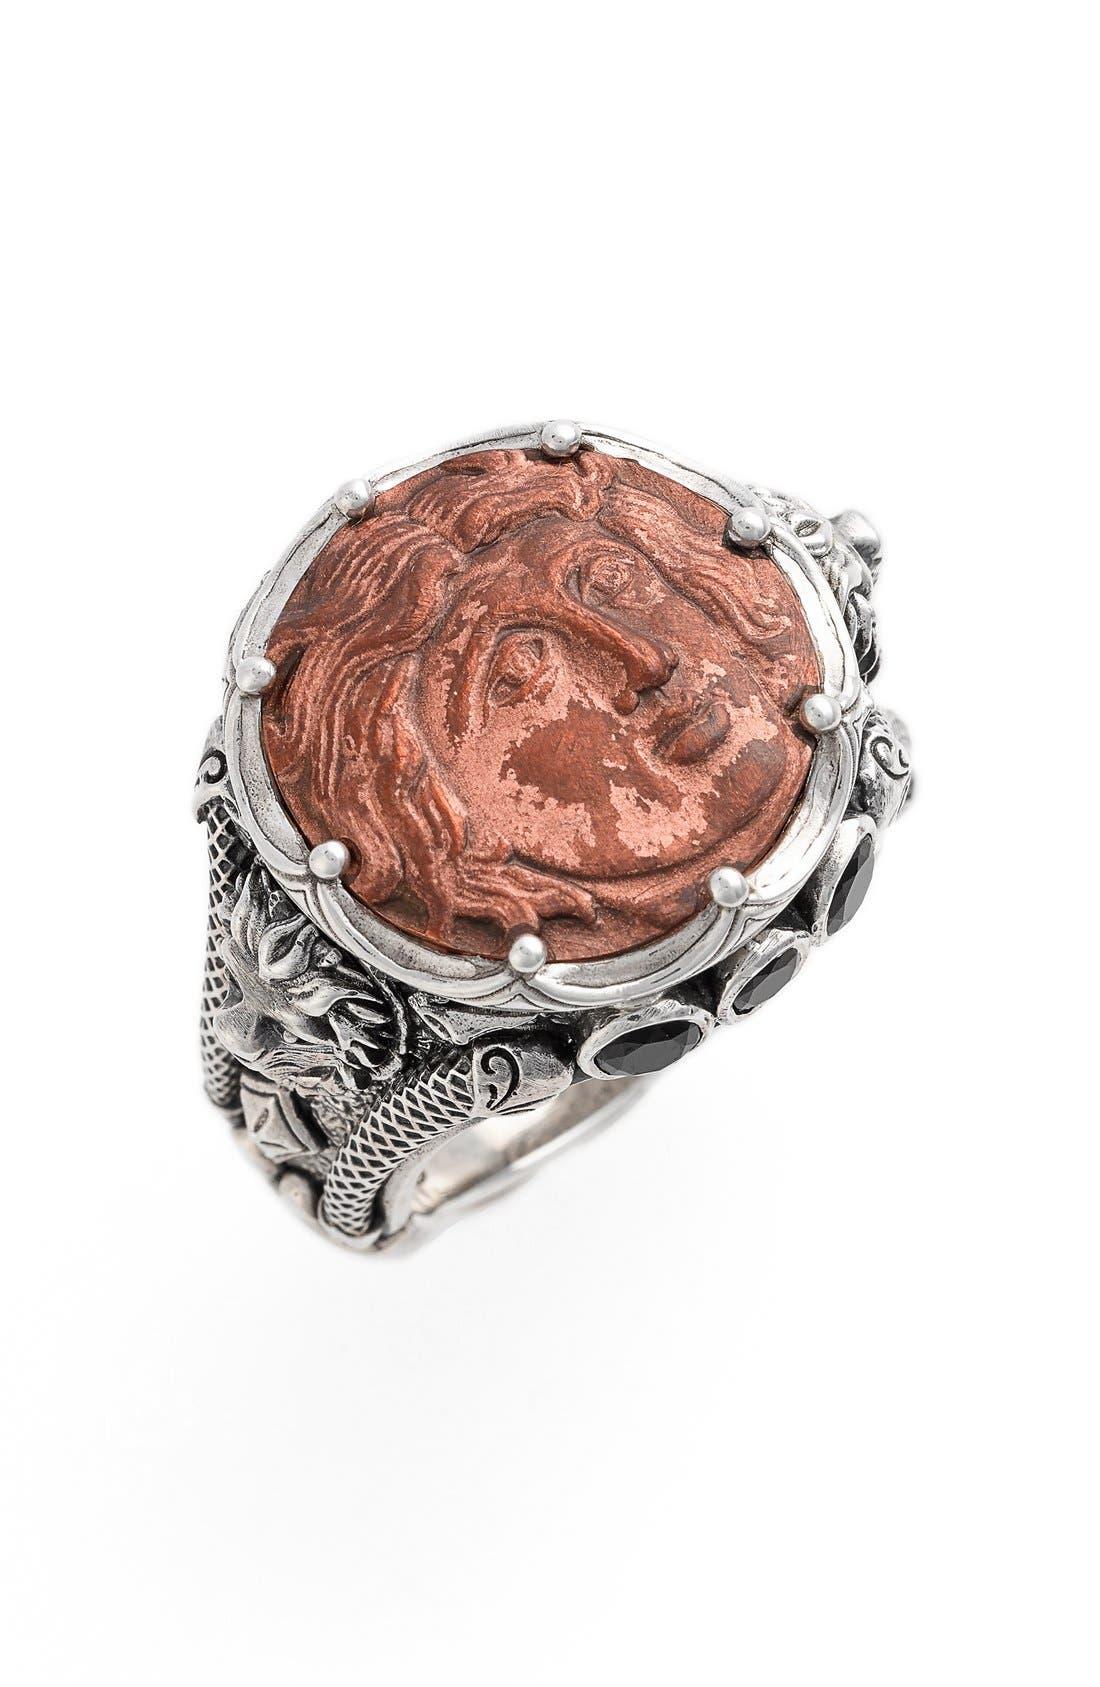 Main Image - Konstantino 'Aeolous' Greek Coin Ring